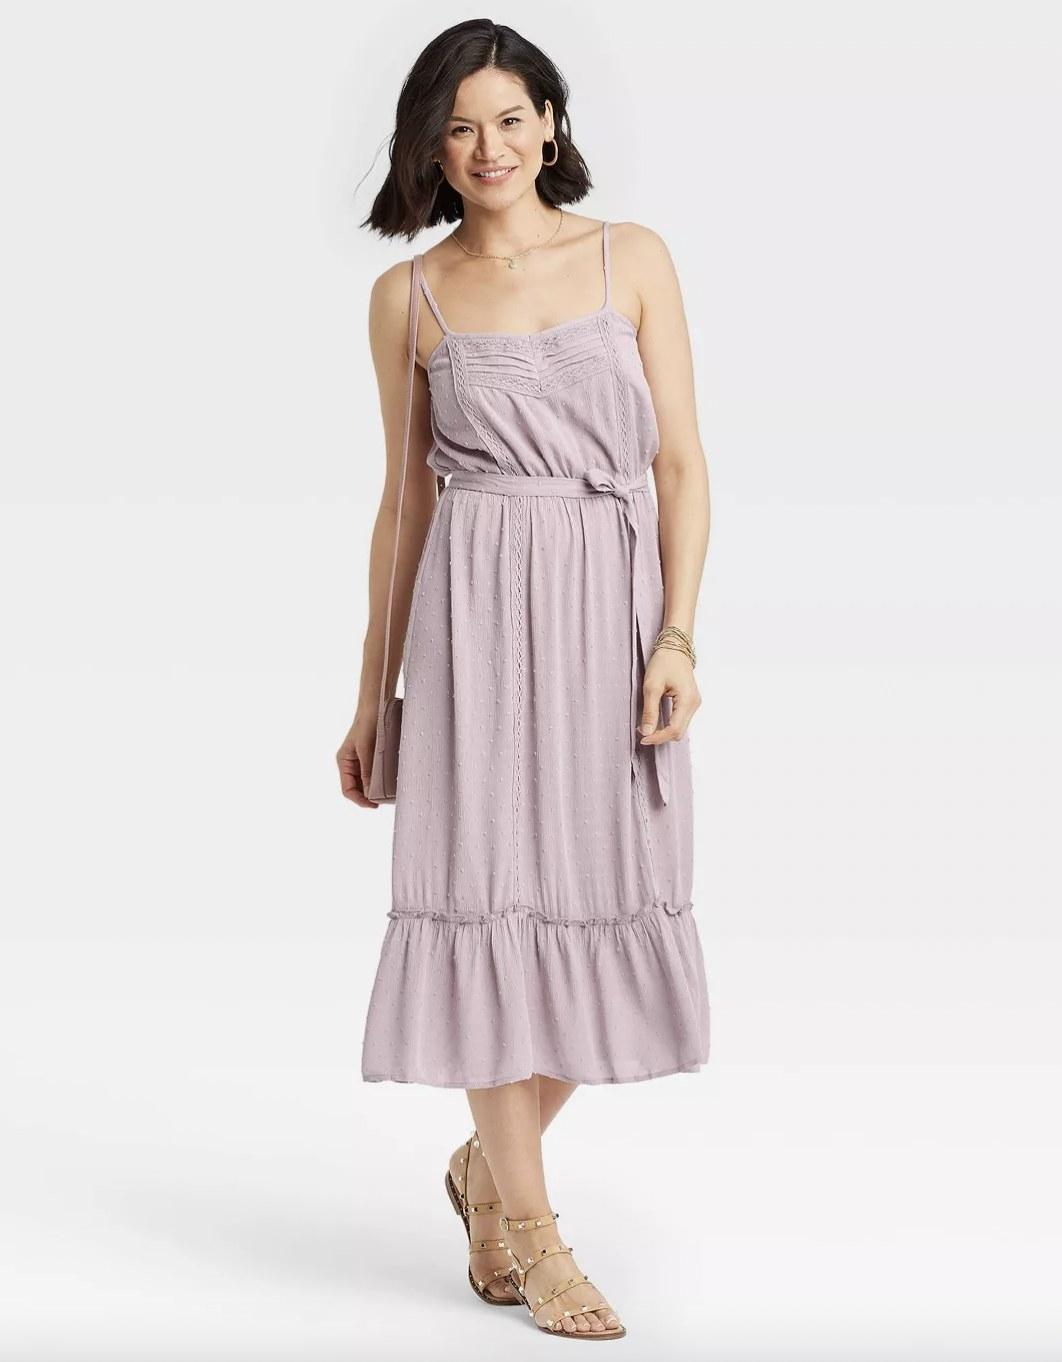 A woman wearing a purple tiered hem dress